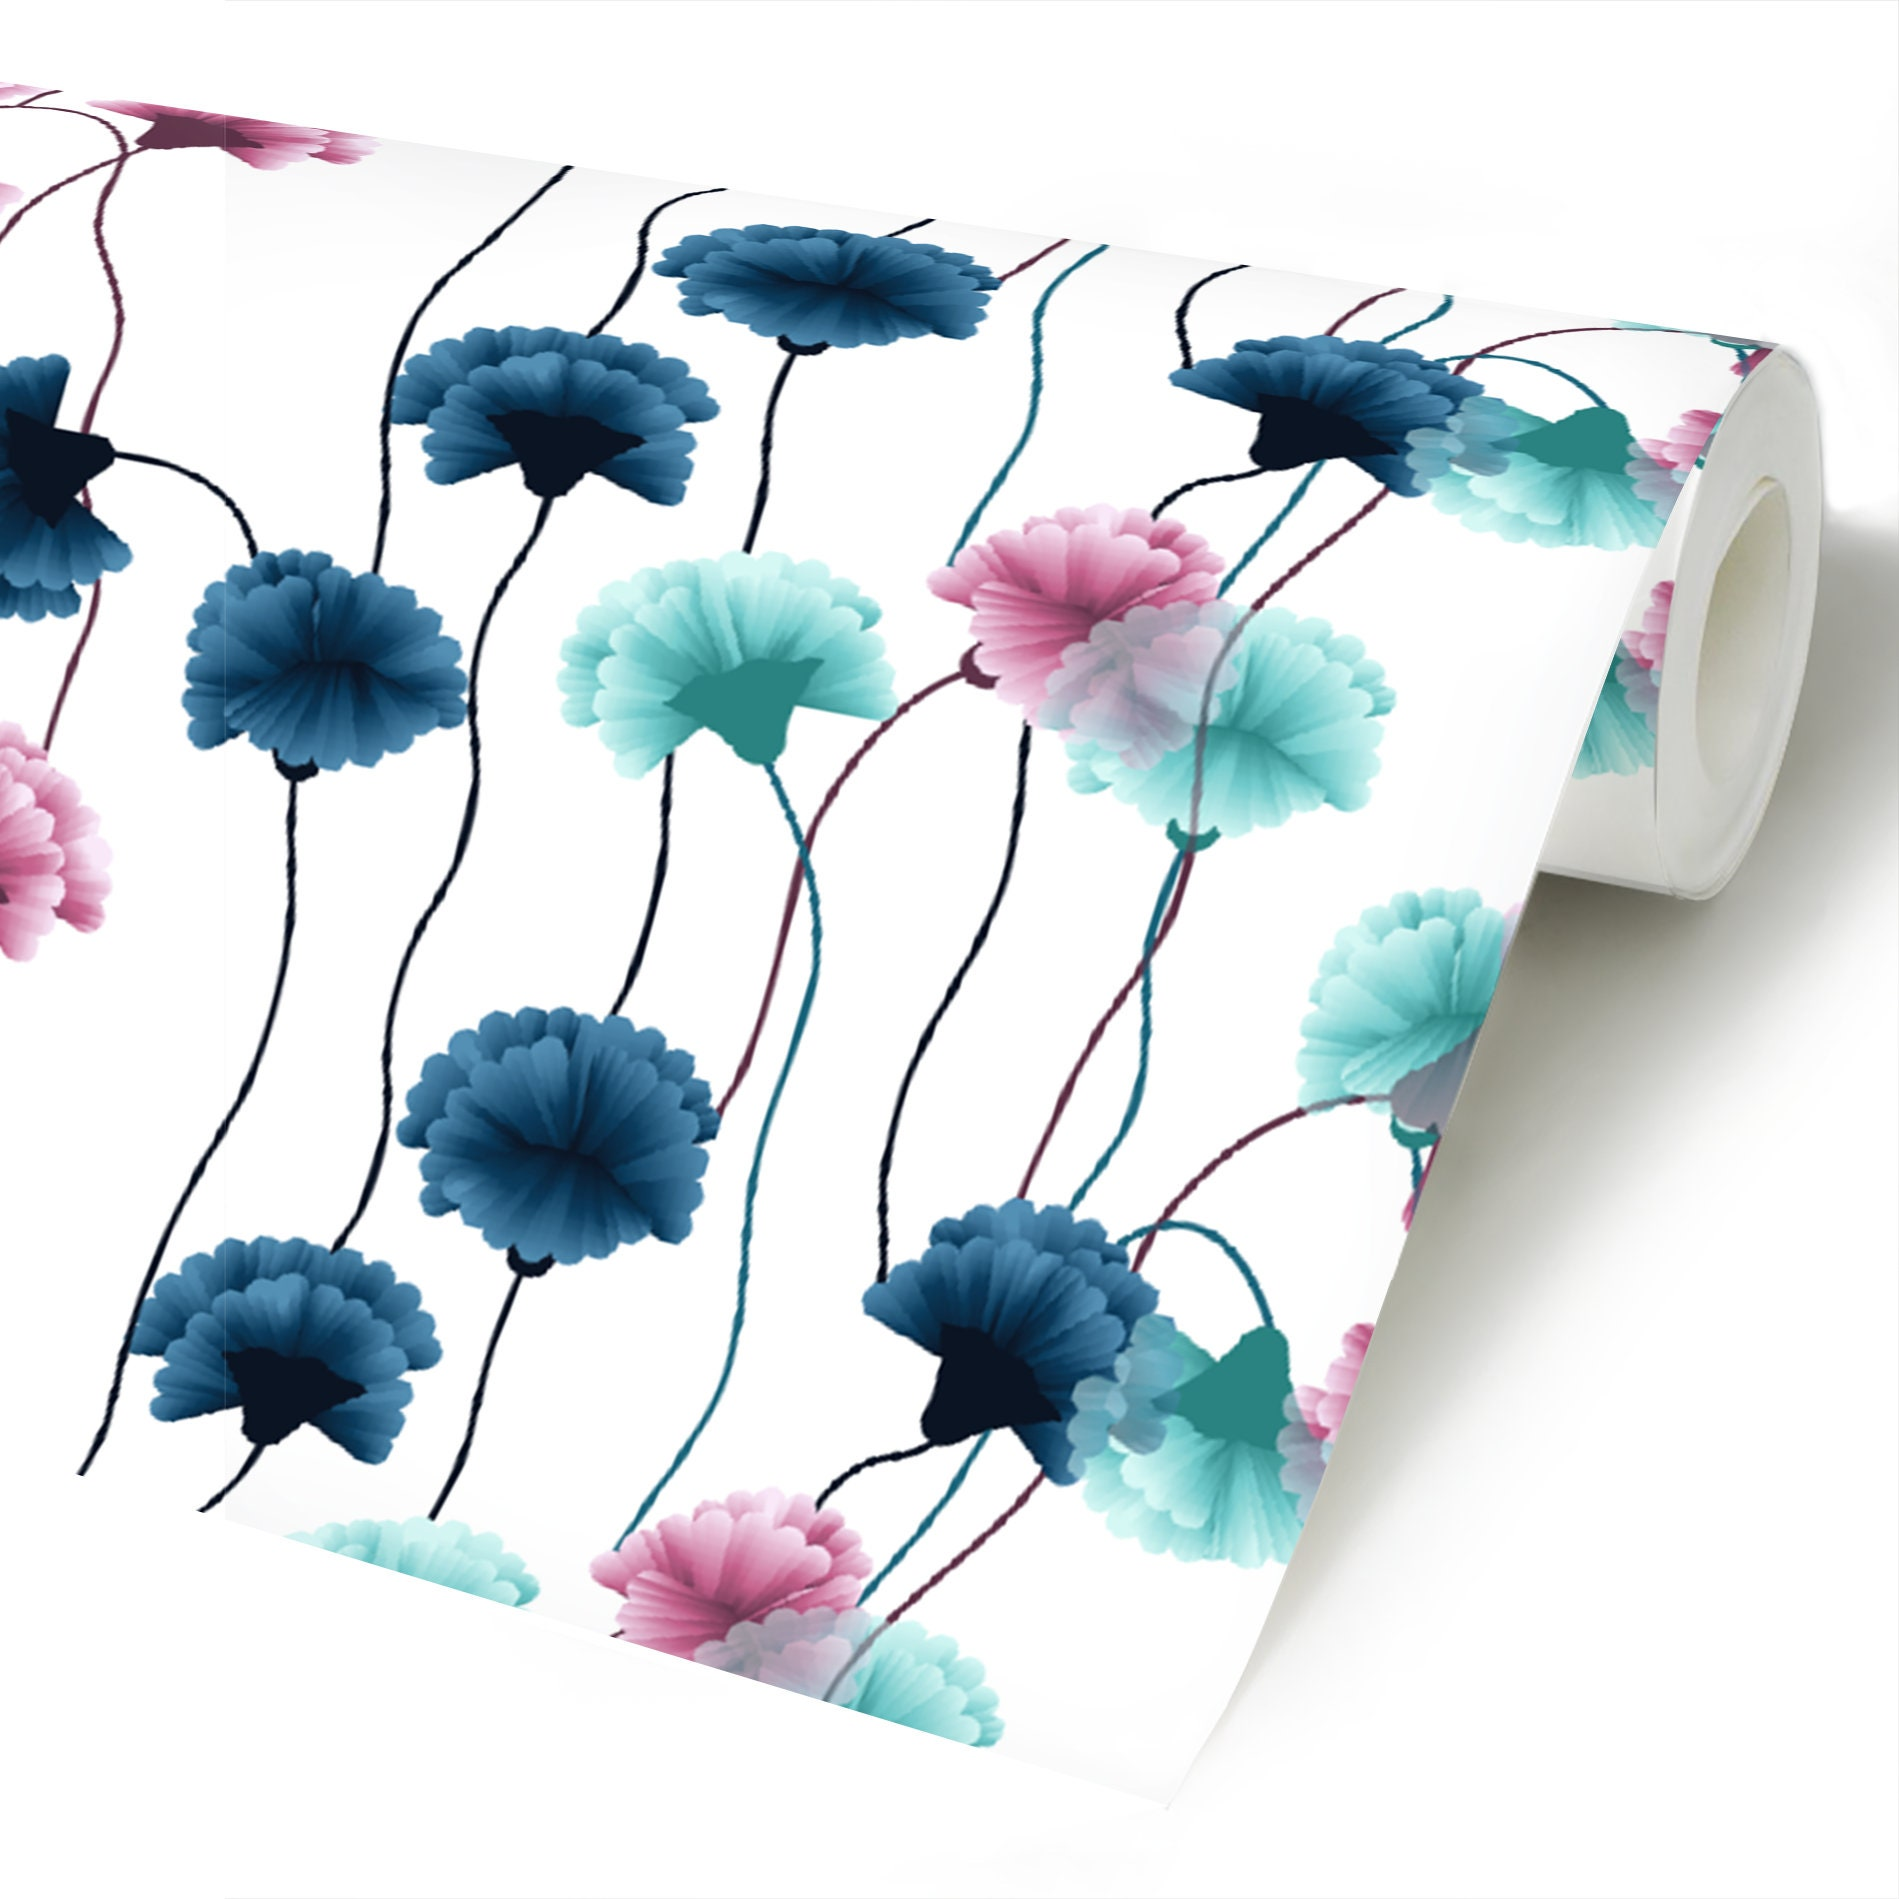 Carnation Flower Peel Stick Wallpaper Blue And Pink Floral Etsy